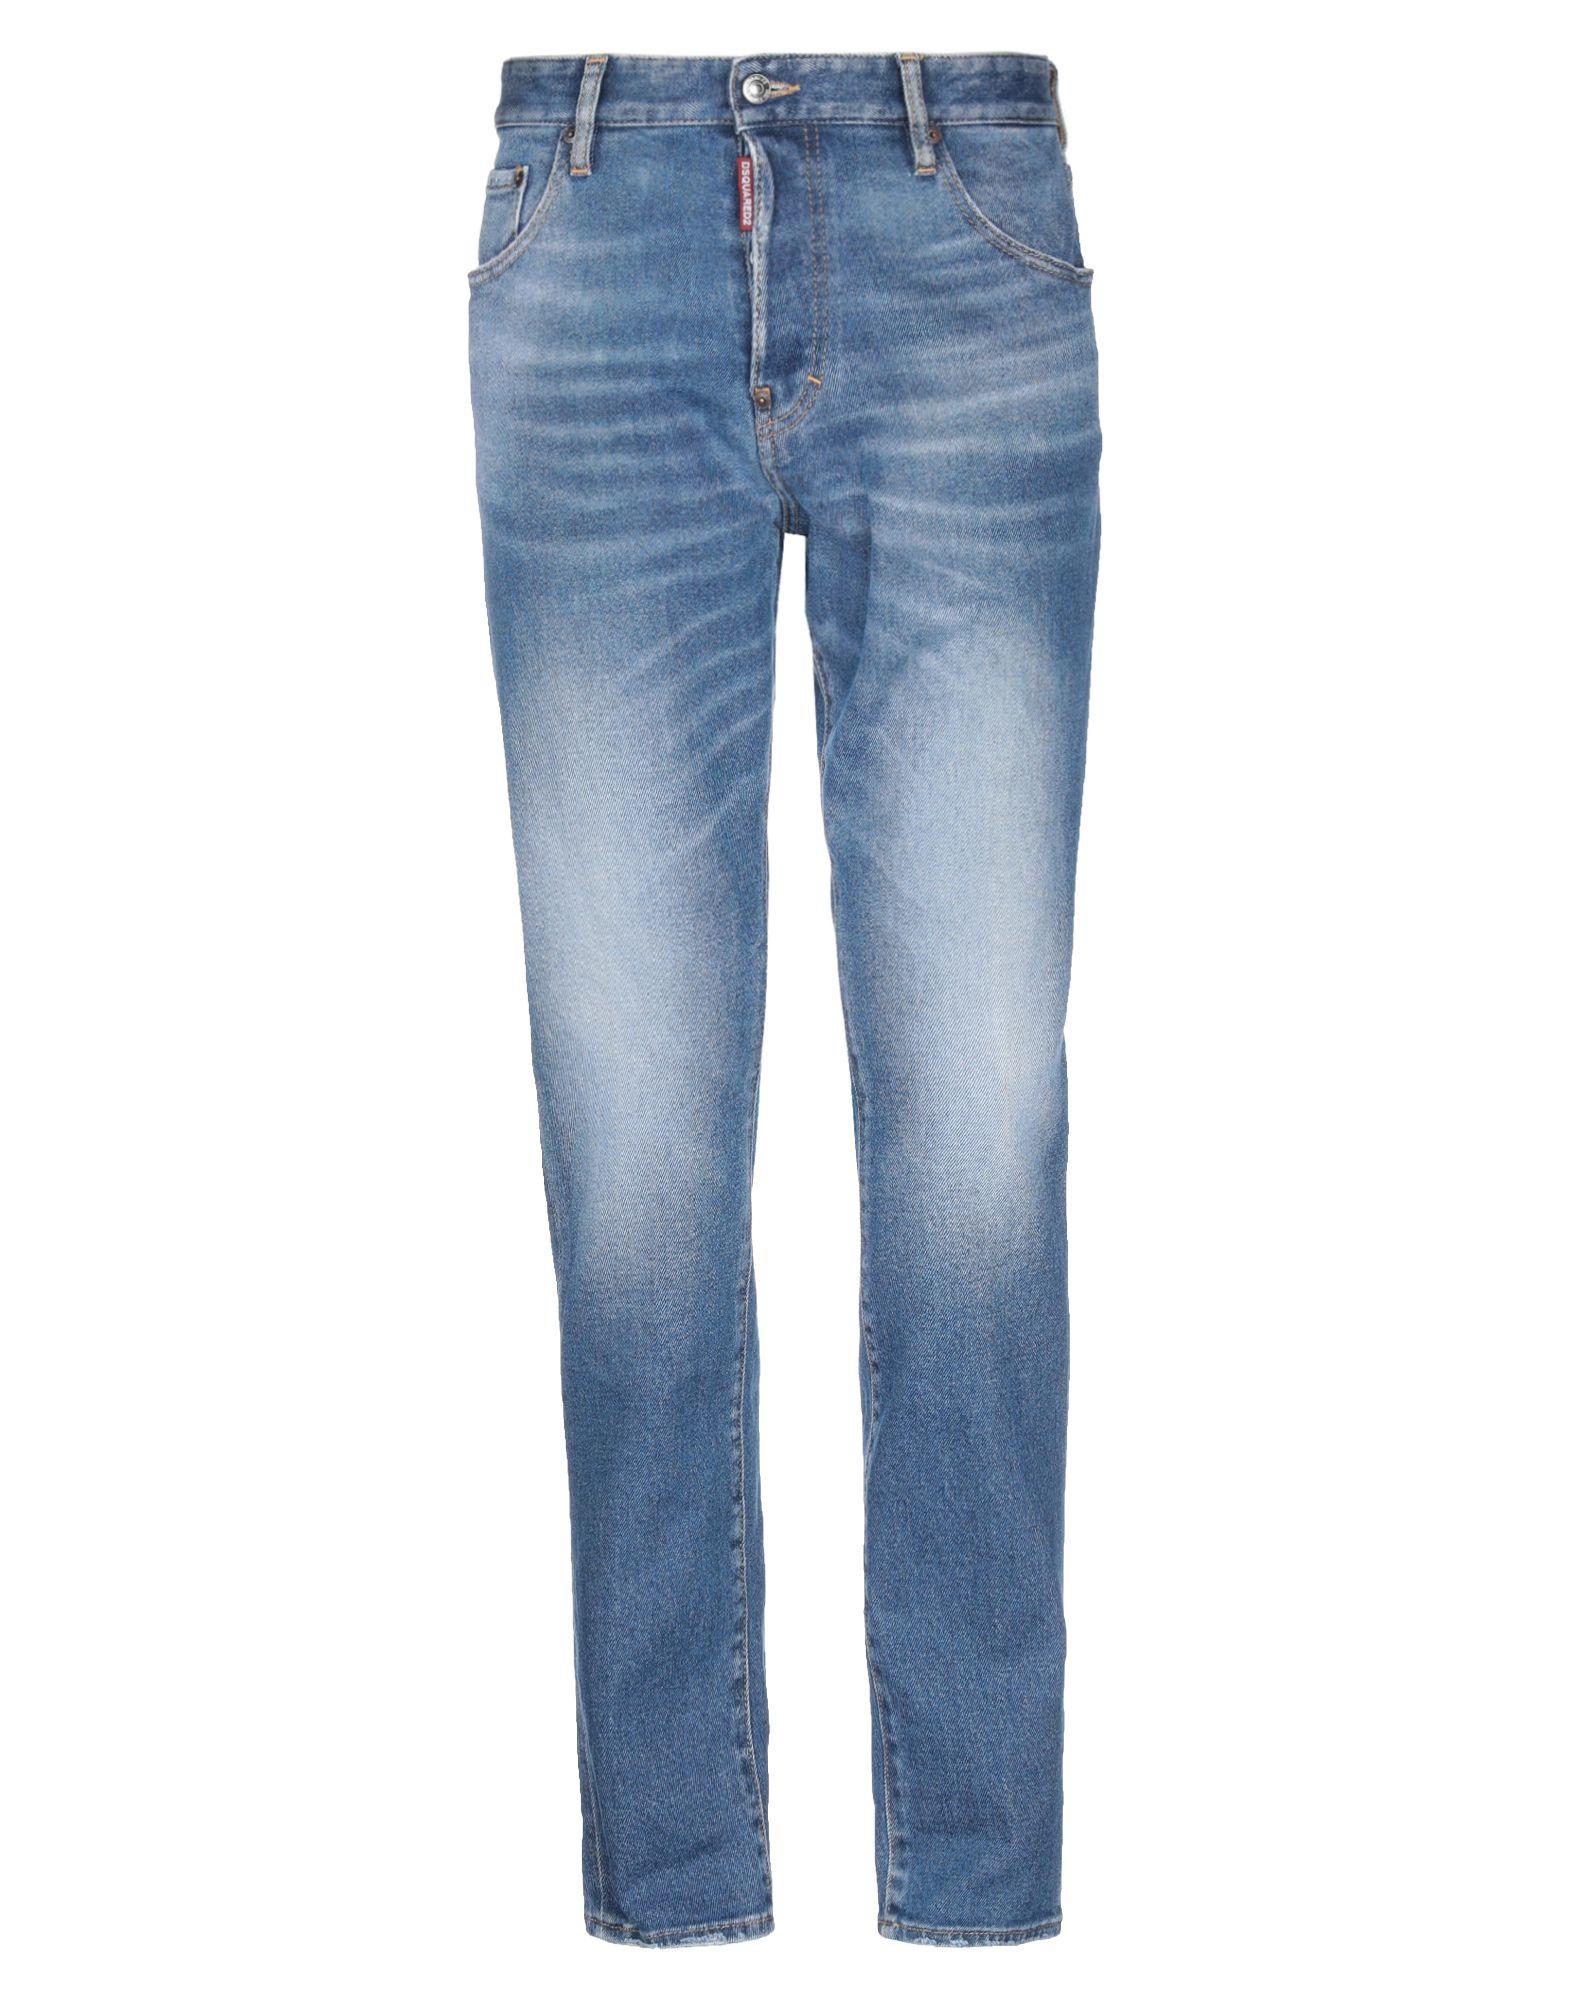 DSQUARED2 Denim pants - Item 42816128